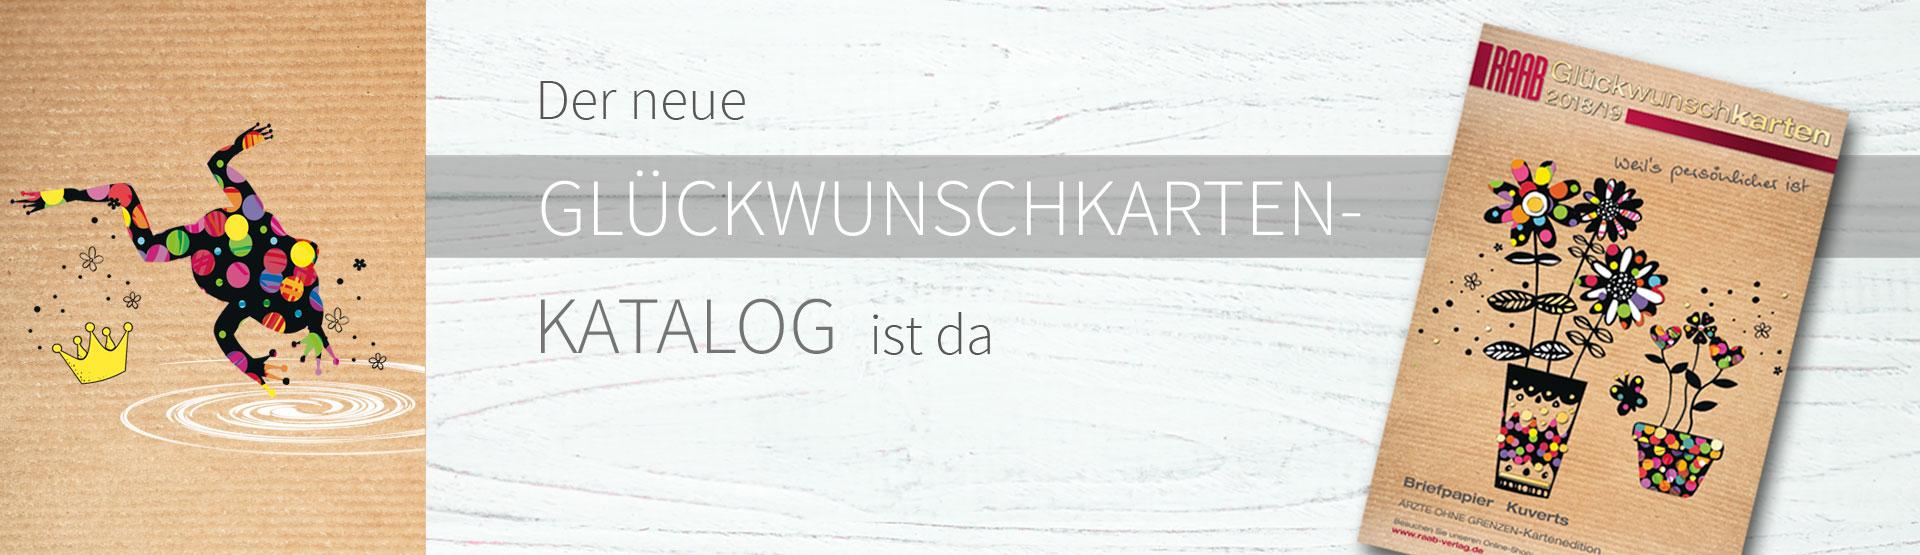 Klapp- & Grußkarten online drucken · Präsente & mehr | Raab-Verlag